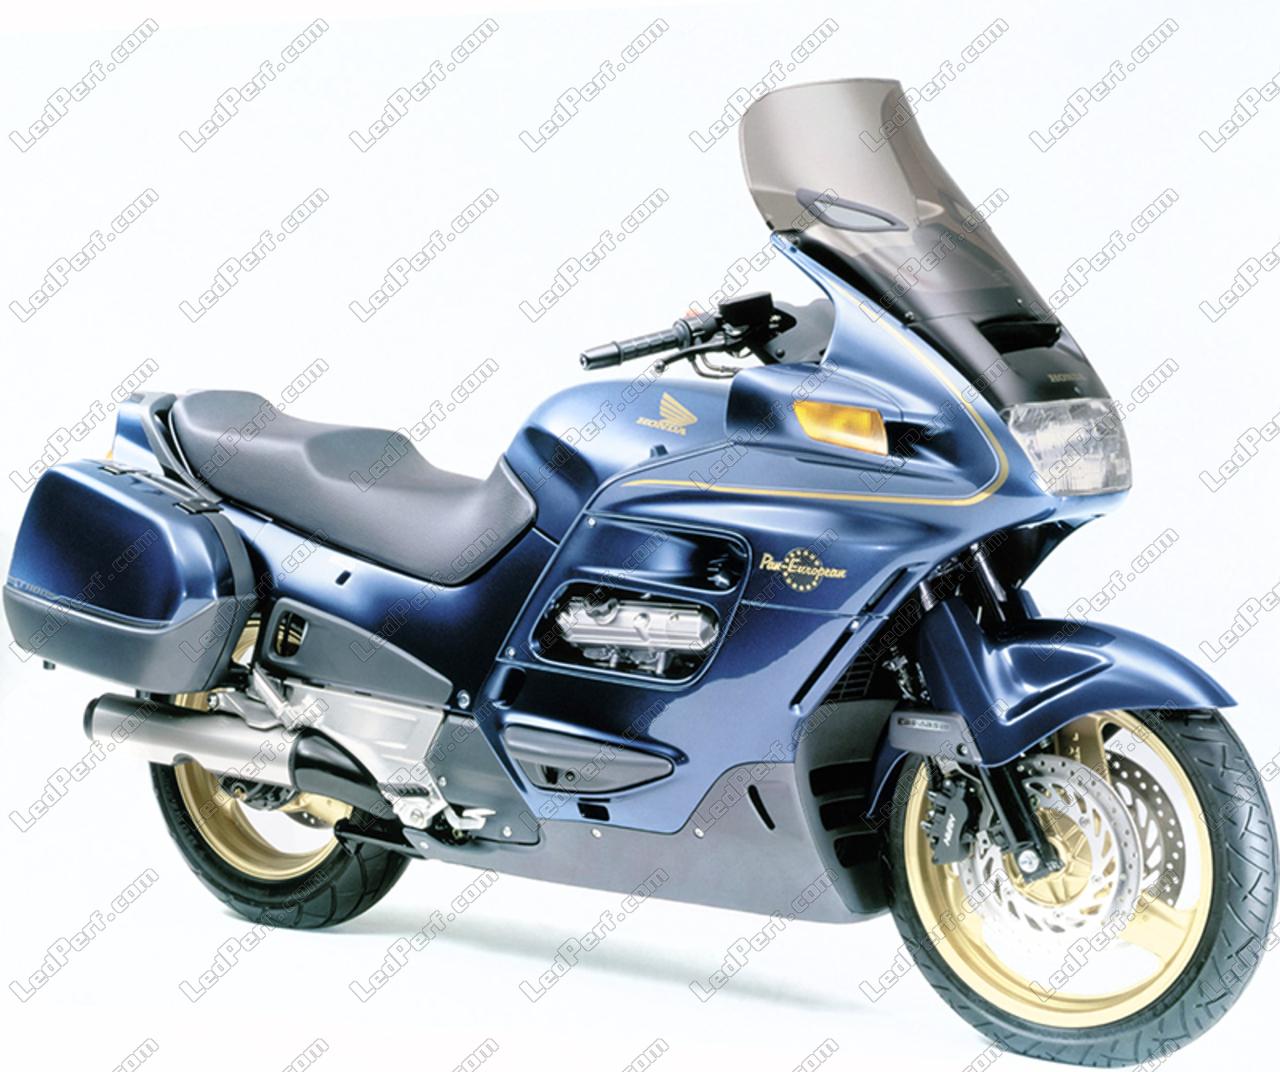 phares additionnels led pour moto honda st 1100 pan european. Black Bedroom Furniture Sets. Home Design Ideas